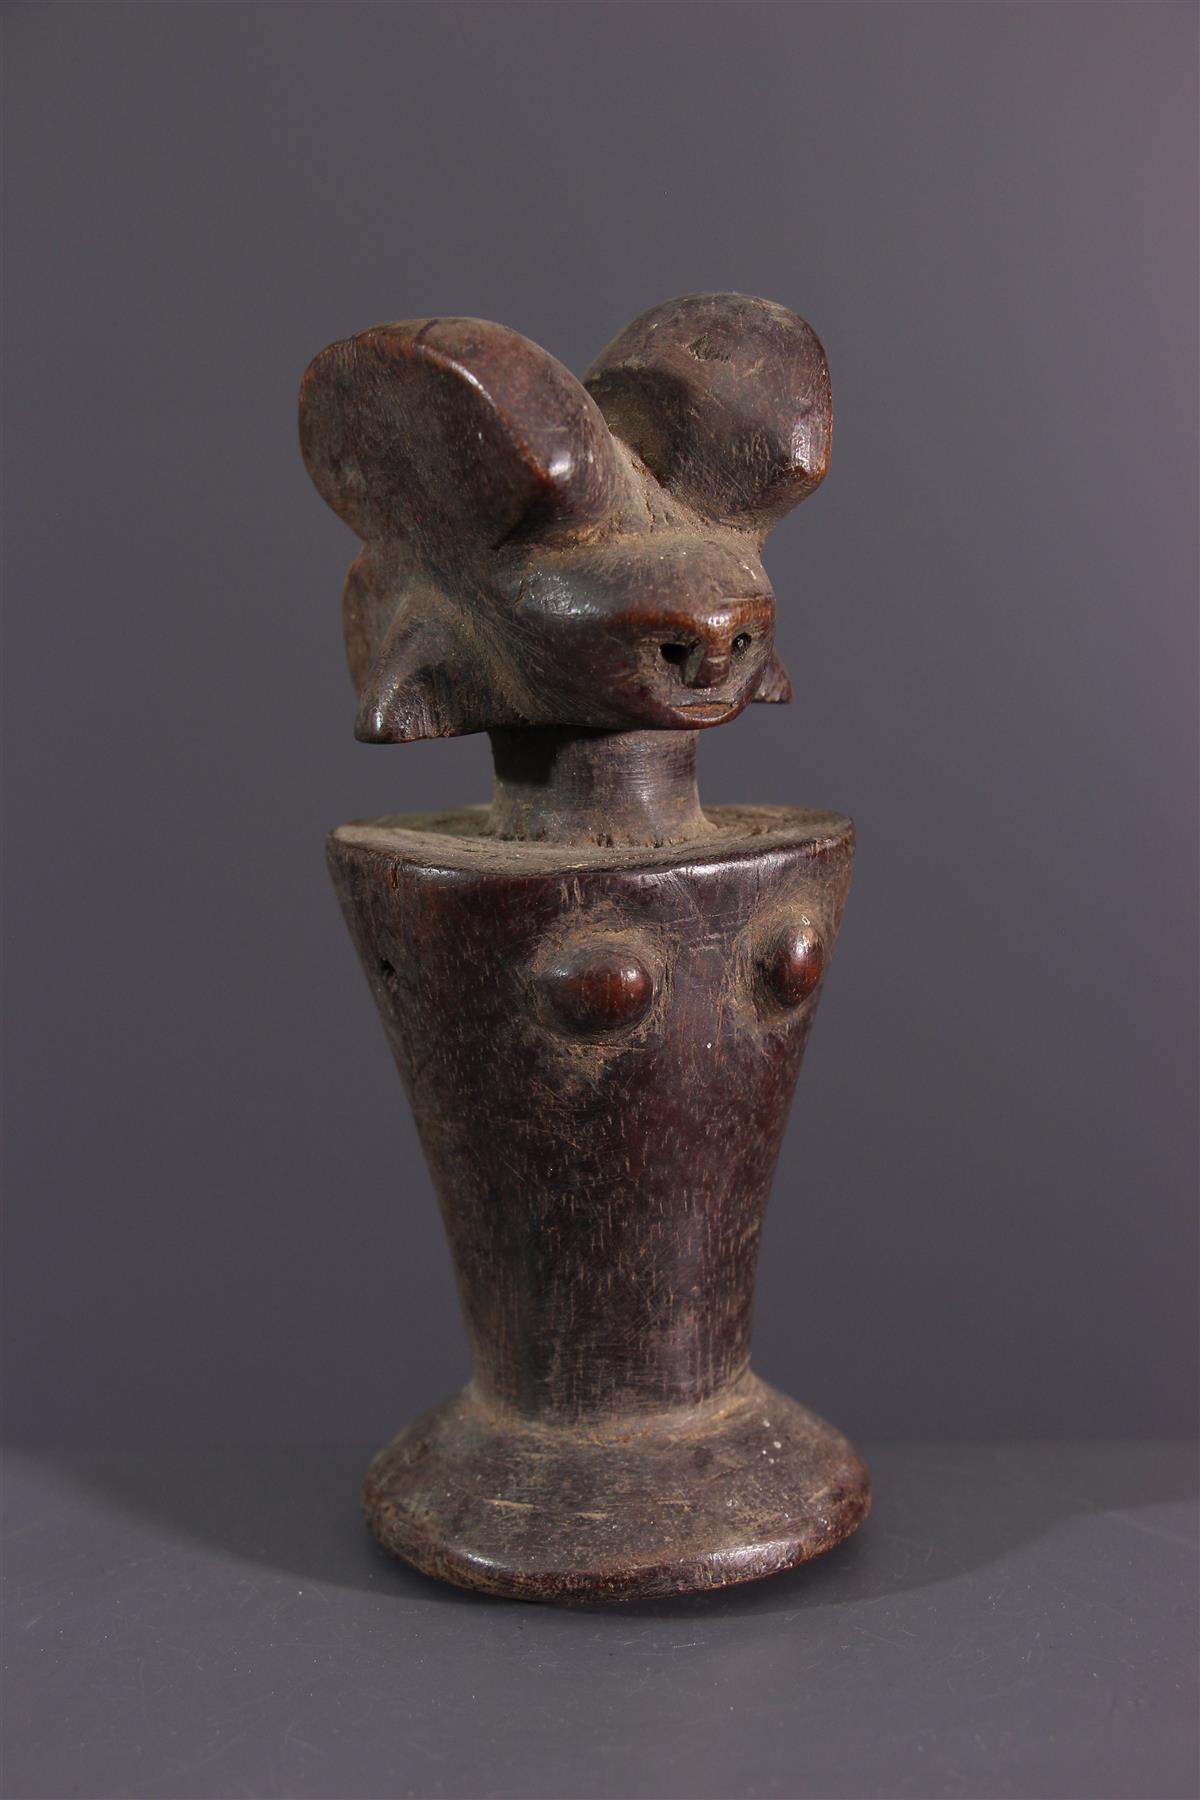 Kwéré doll - African art